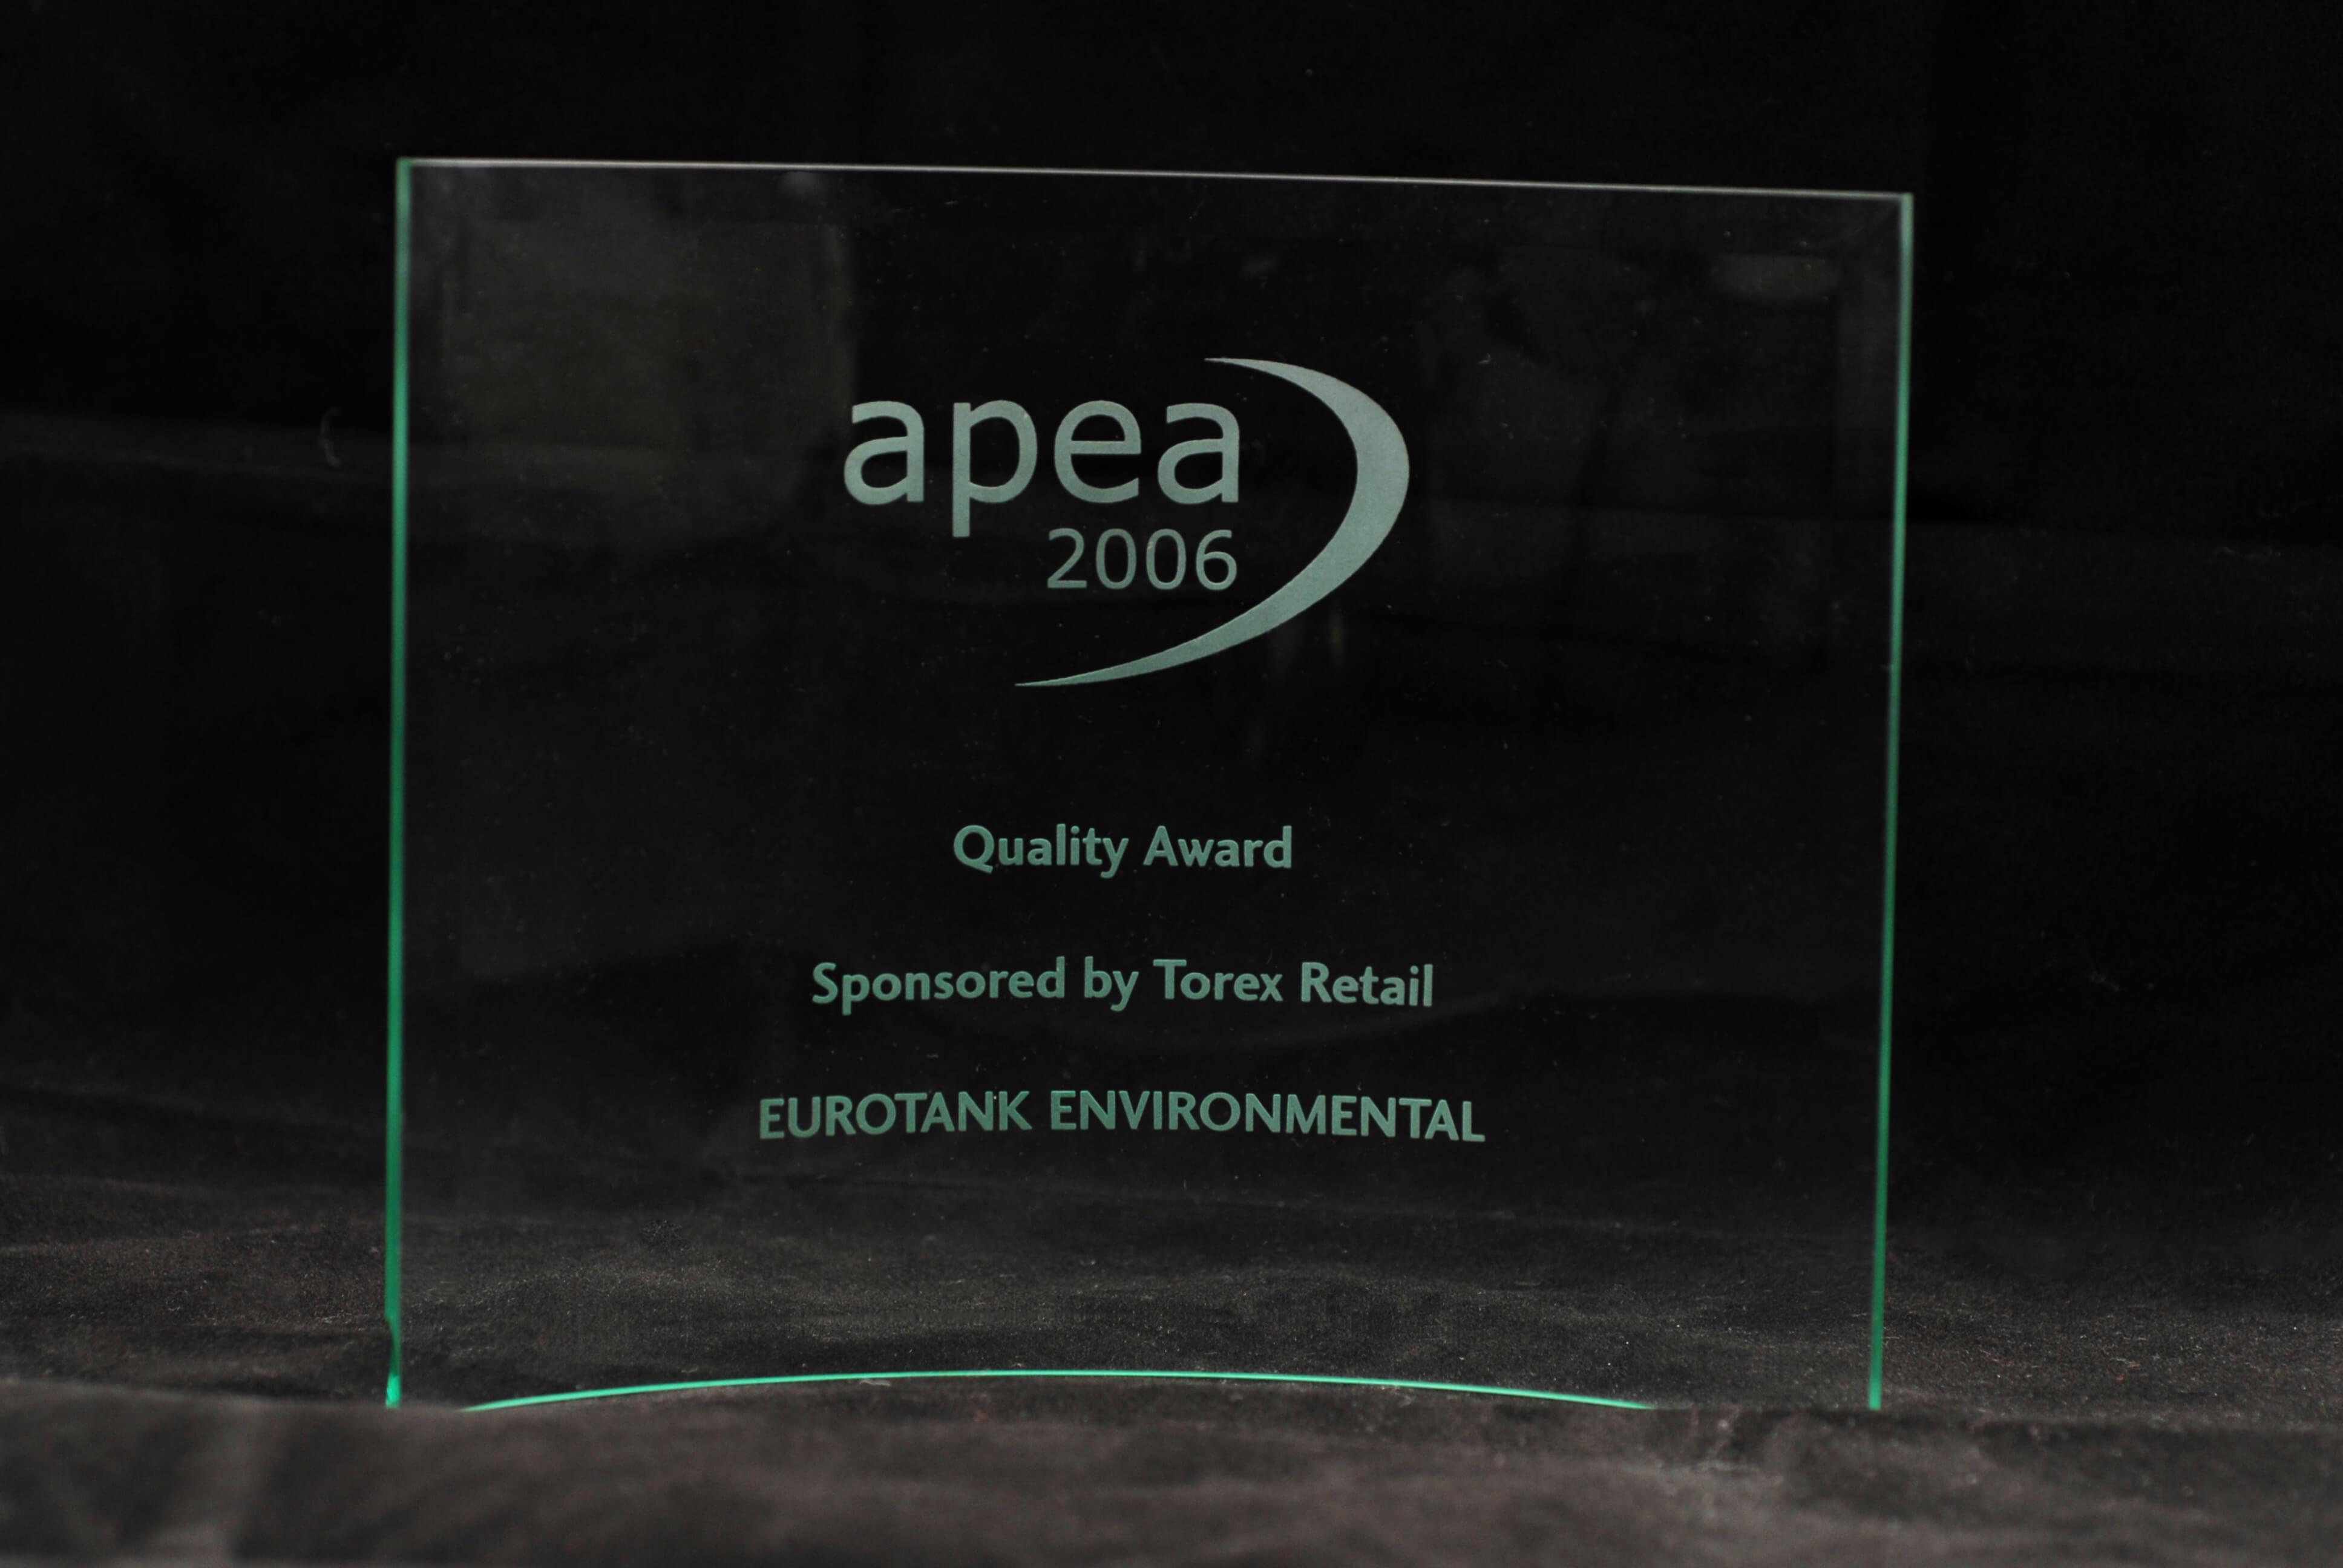 APEA Quality Award for development